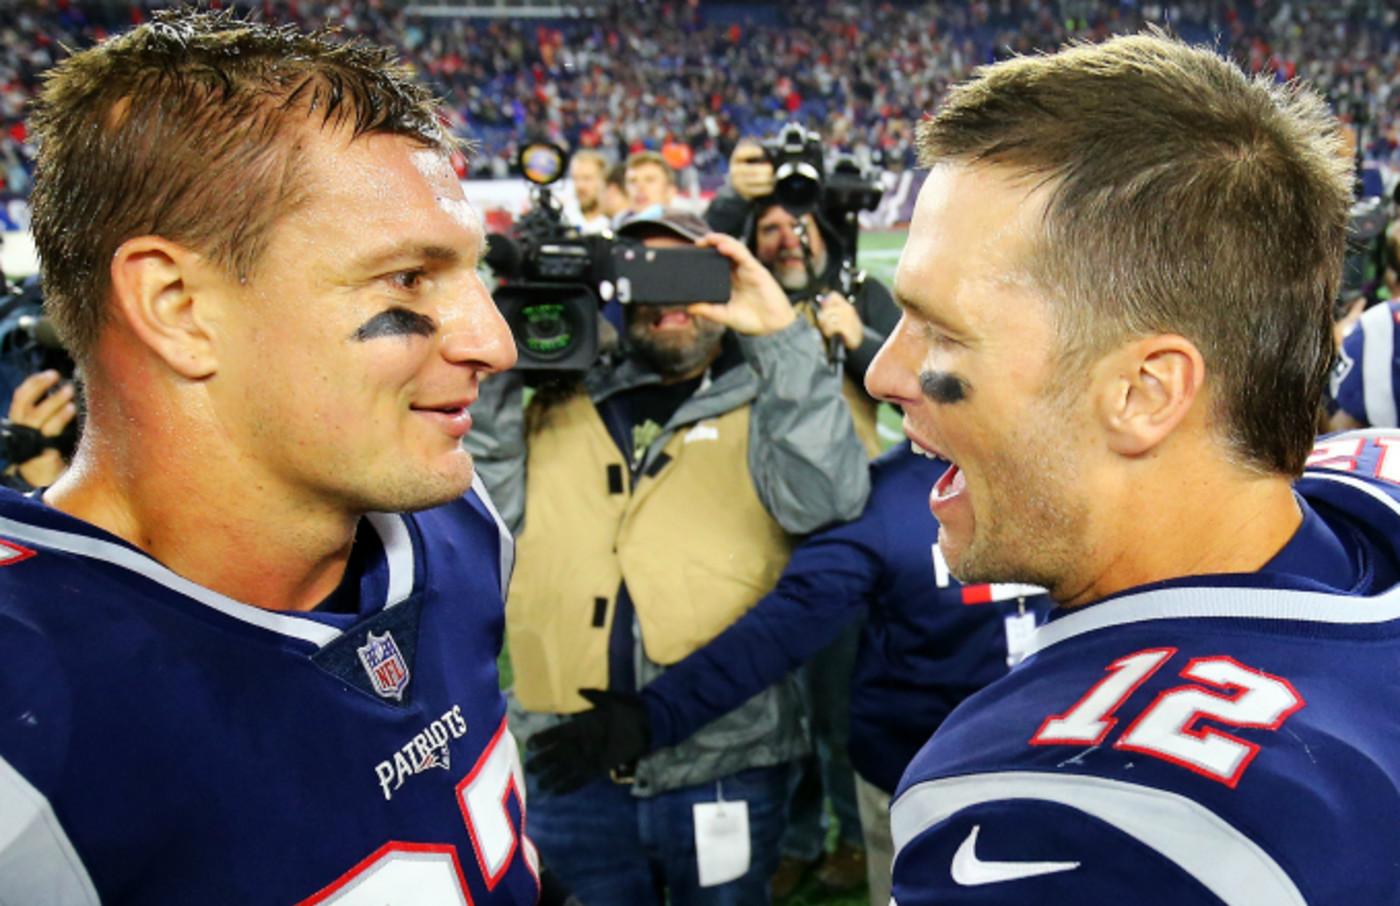 Tom Brady #12 talks to Rob Gronkowski #87 of the New England Patriots